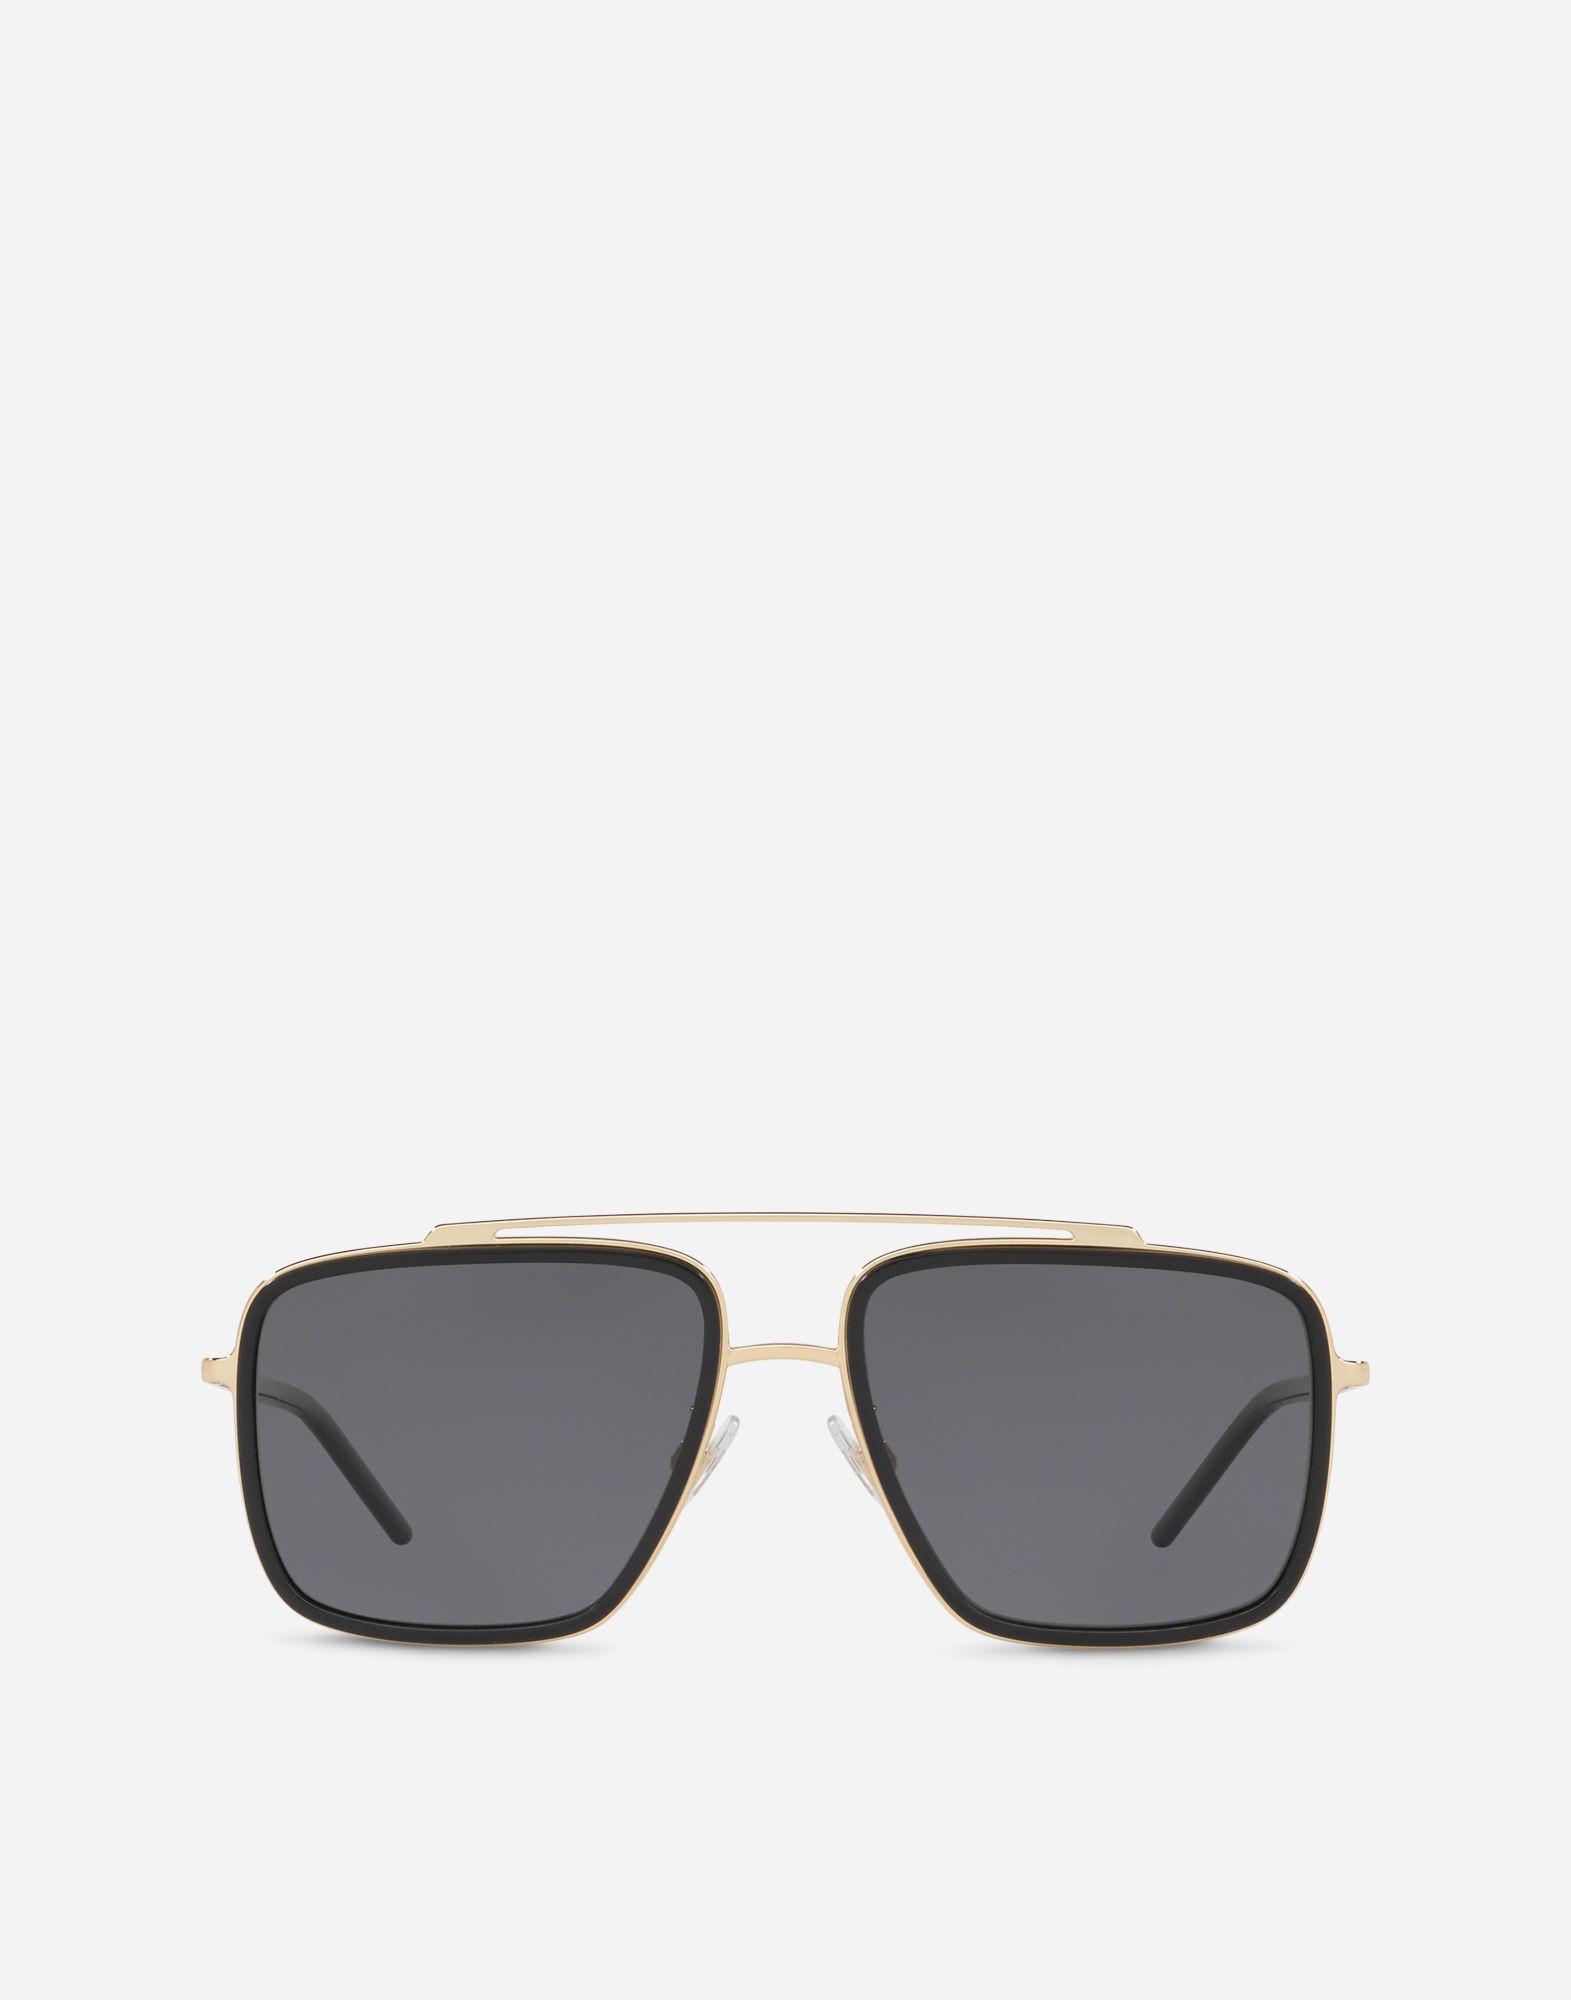 eb55a343cd1 Lyst - Dolce   Gabbana Madison Sunglasses in Metallic for Men